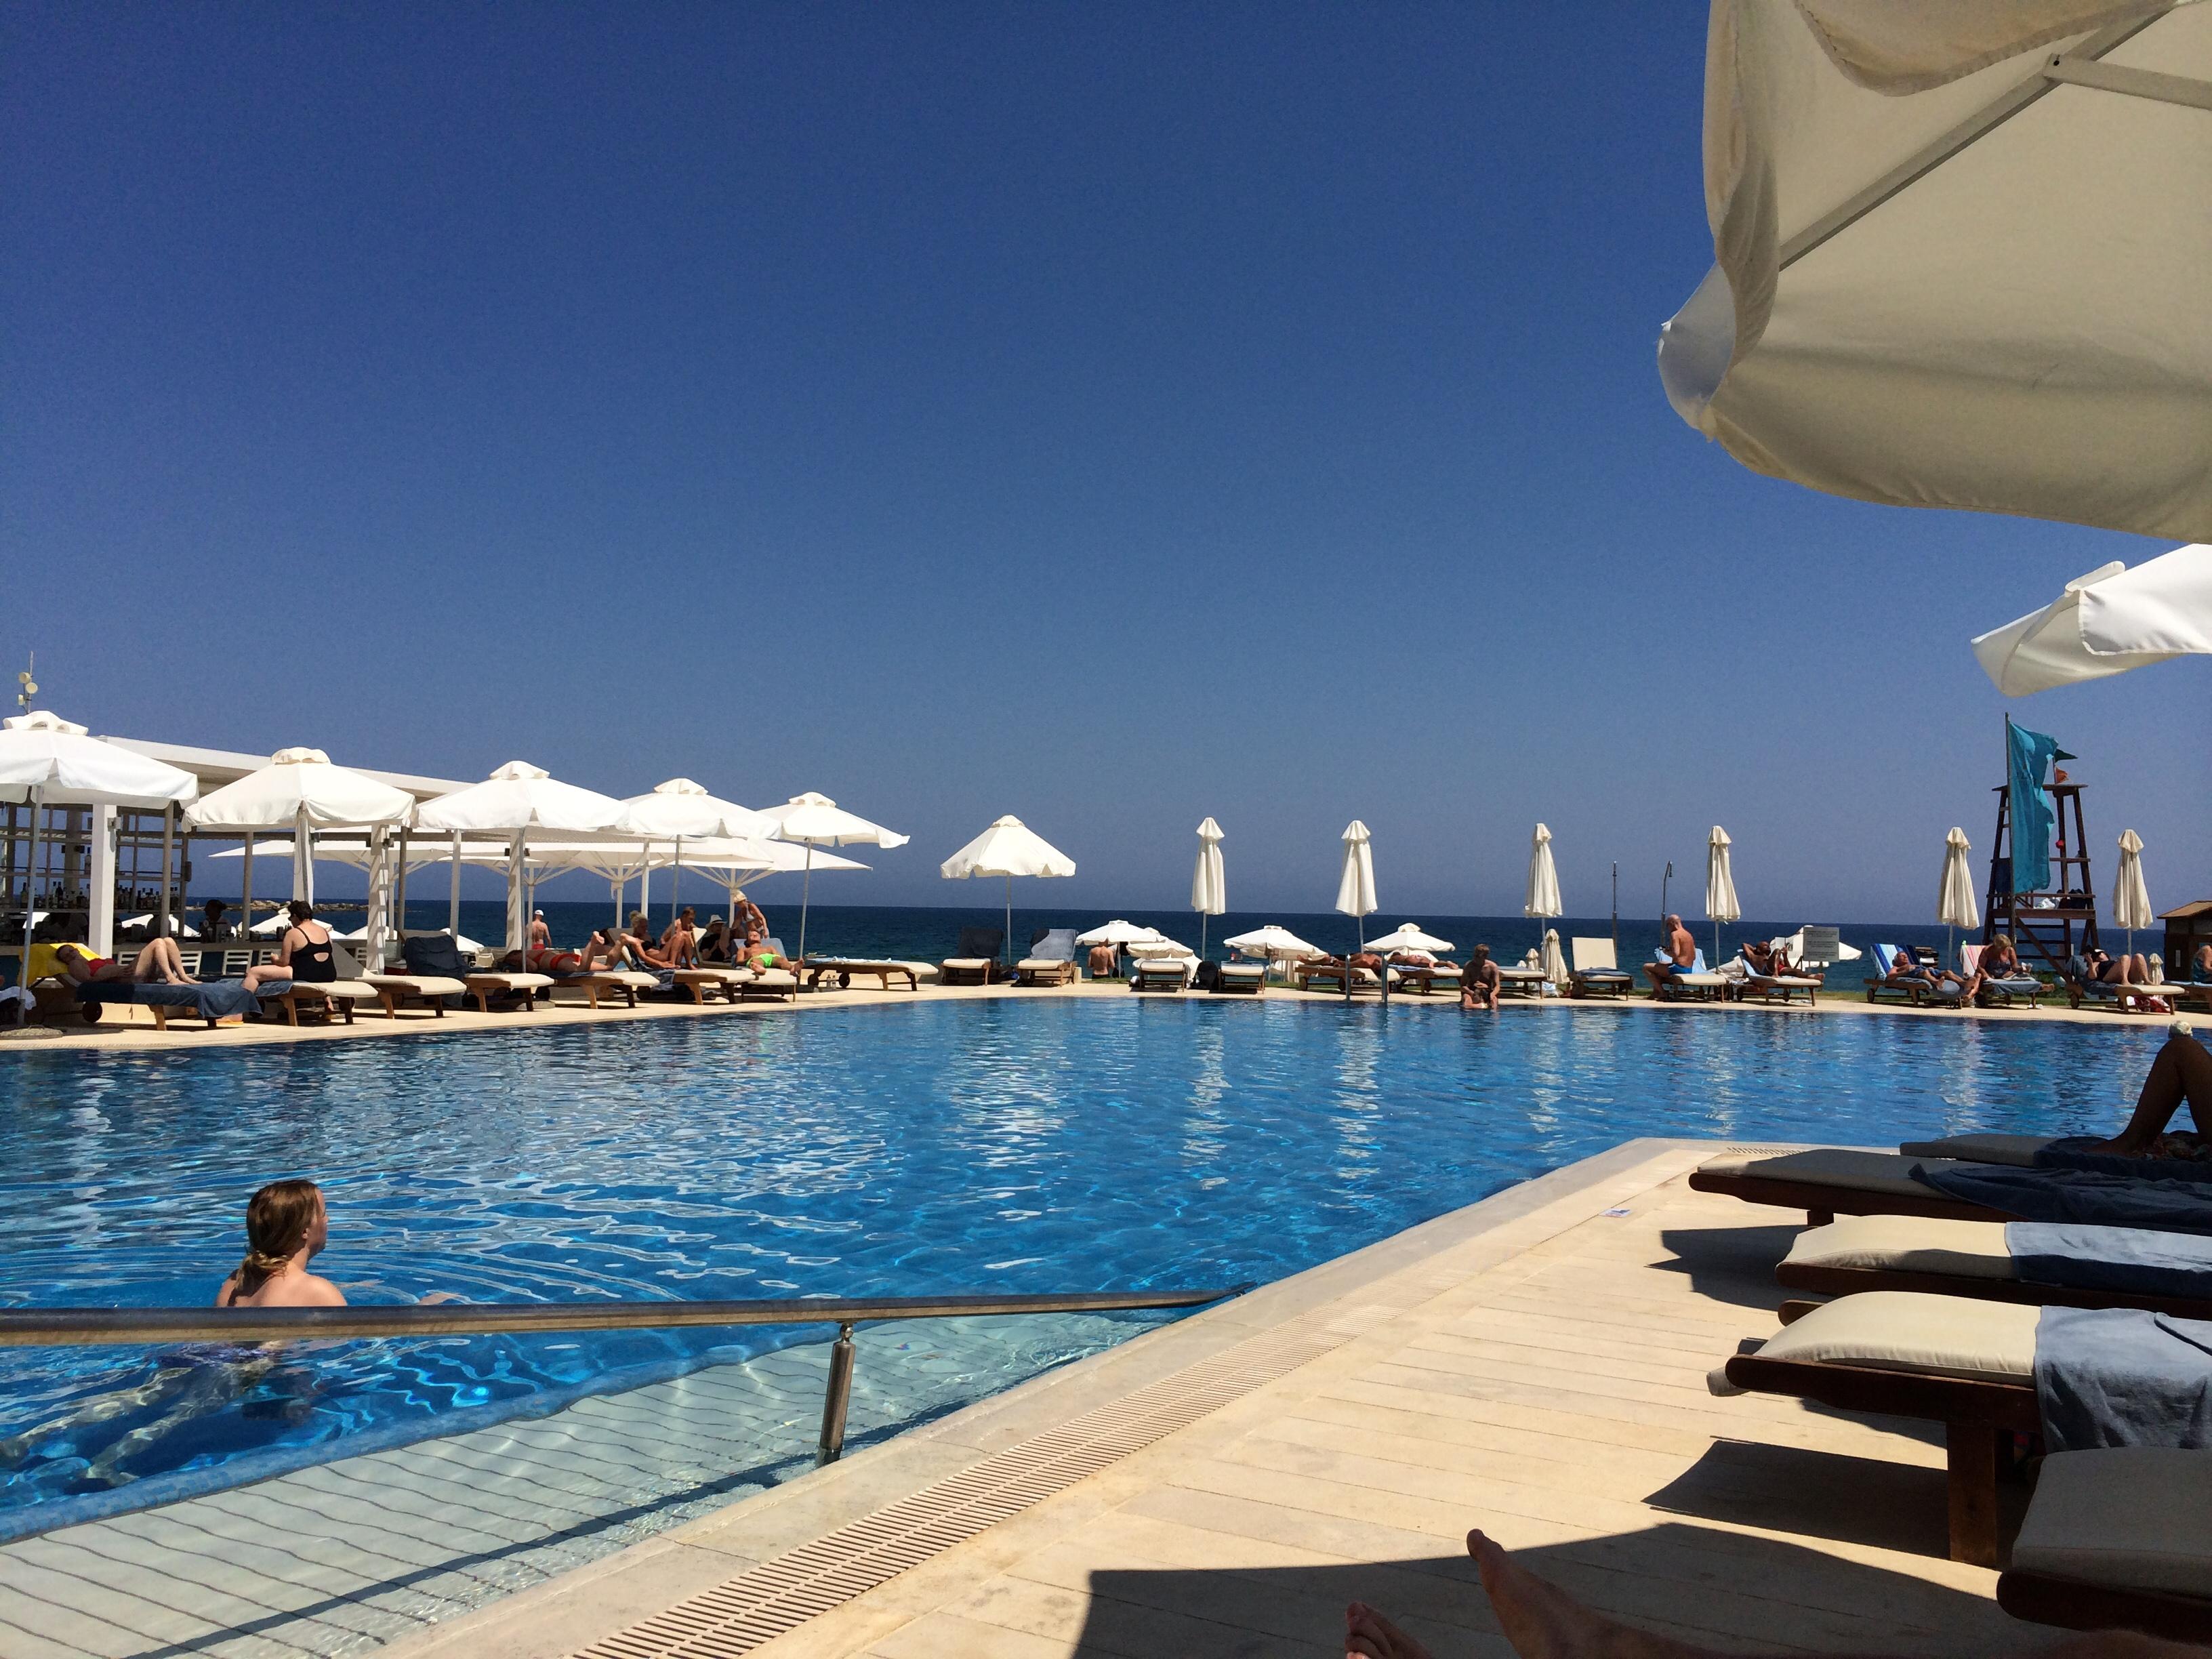 Hotell For Voksne Pa Kreta Atlantica Kalliston Resort Spa